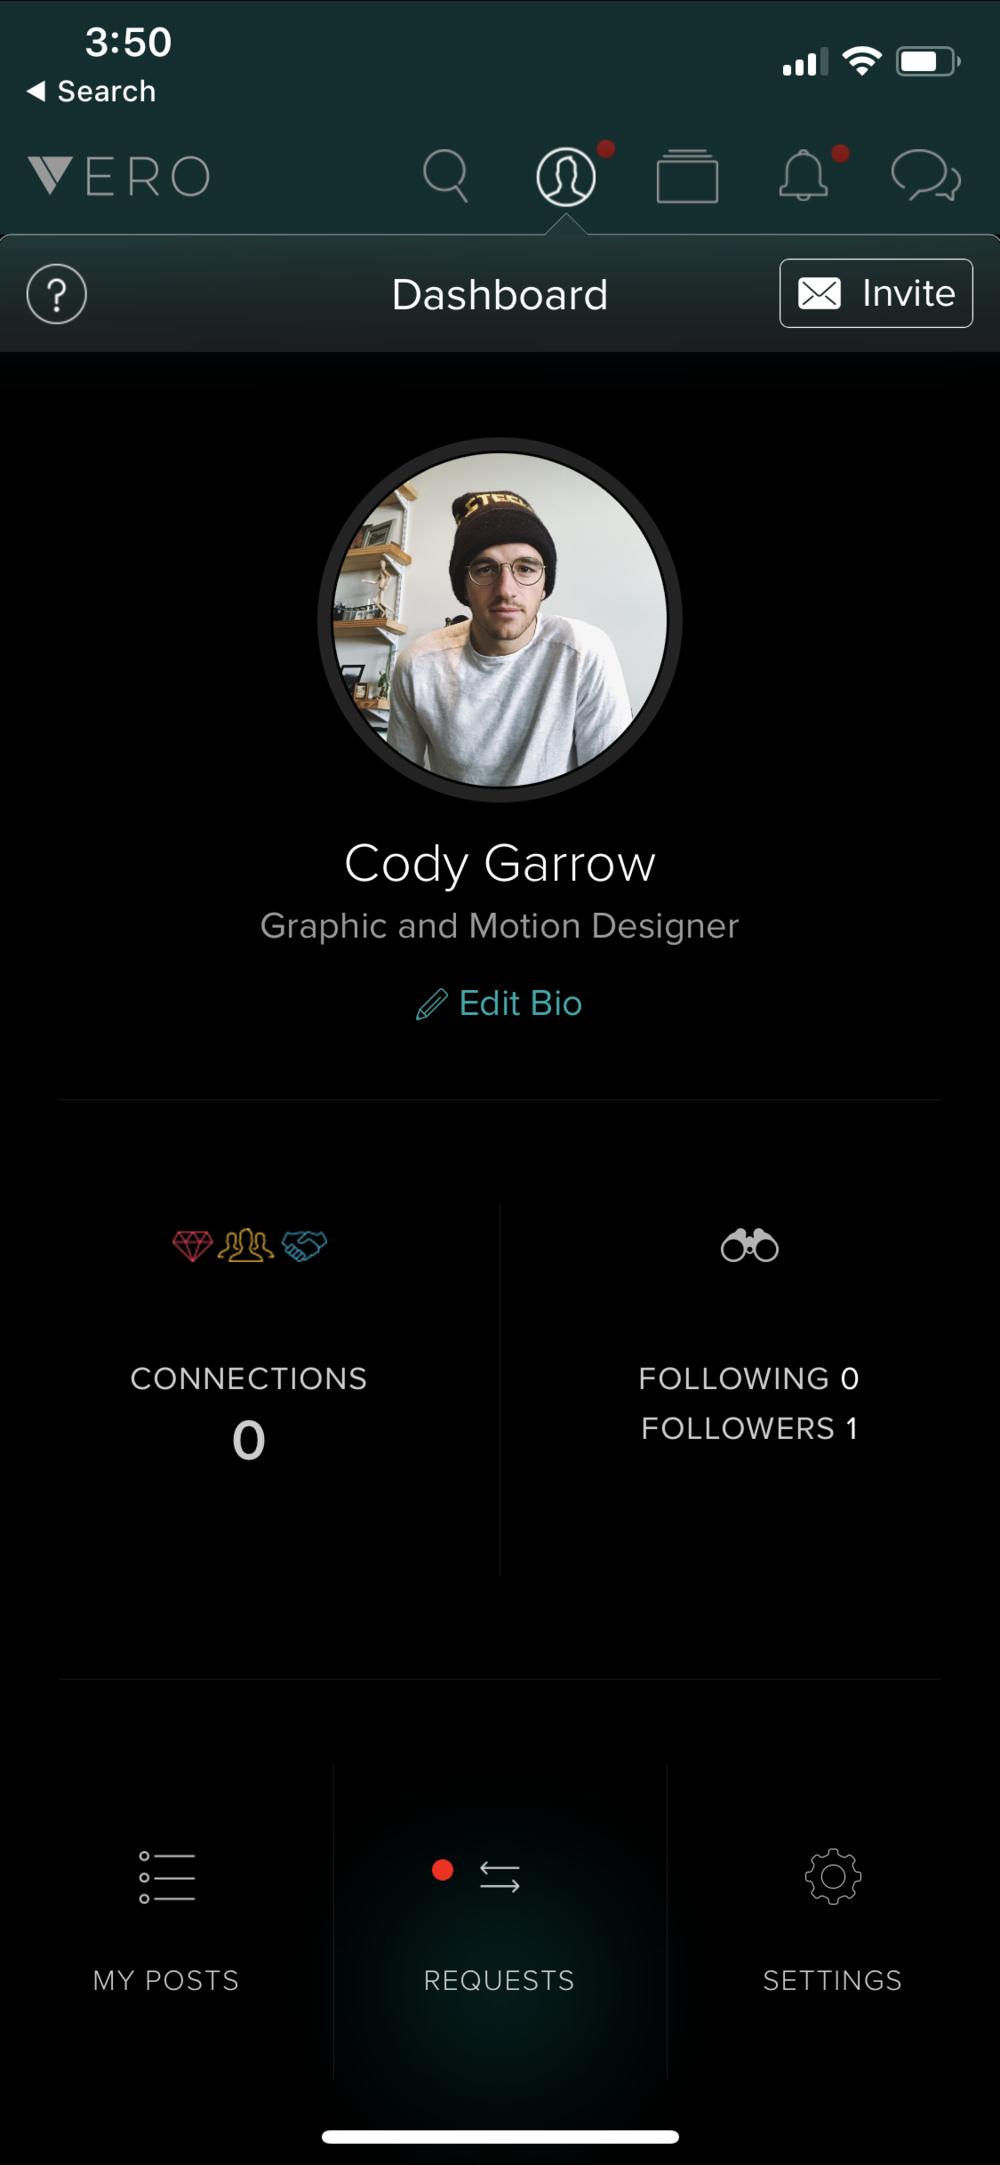 Vero Cody Garrow Profile